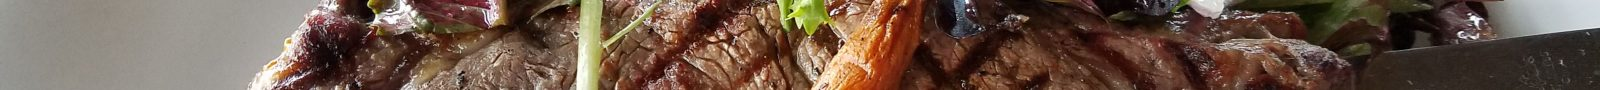 Dry Aged Ribeye Steak